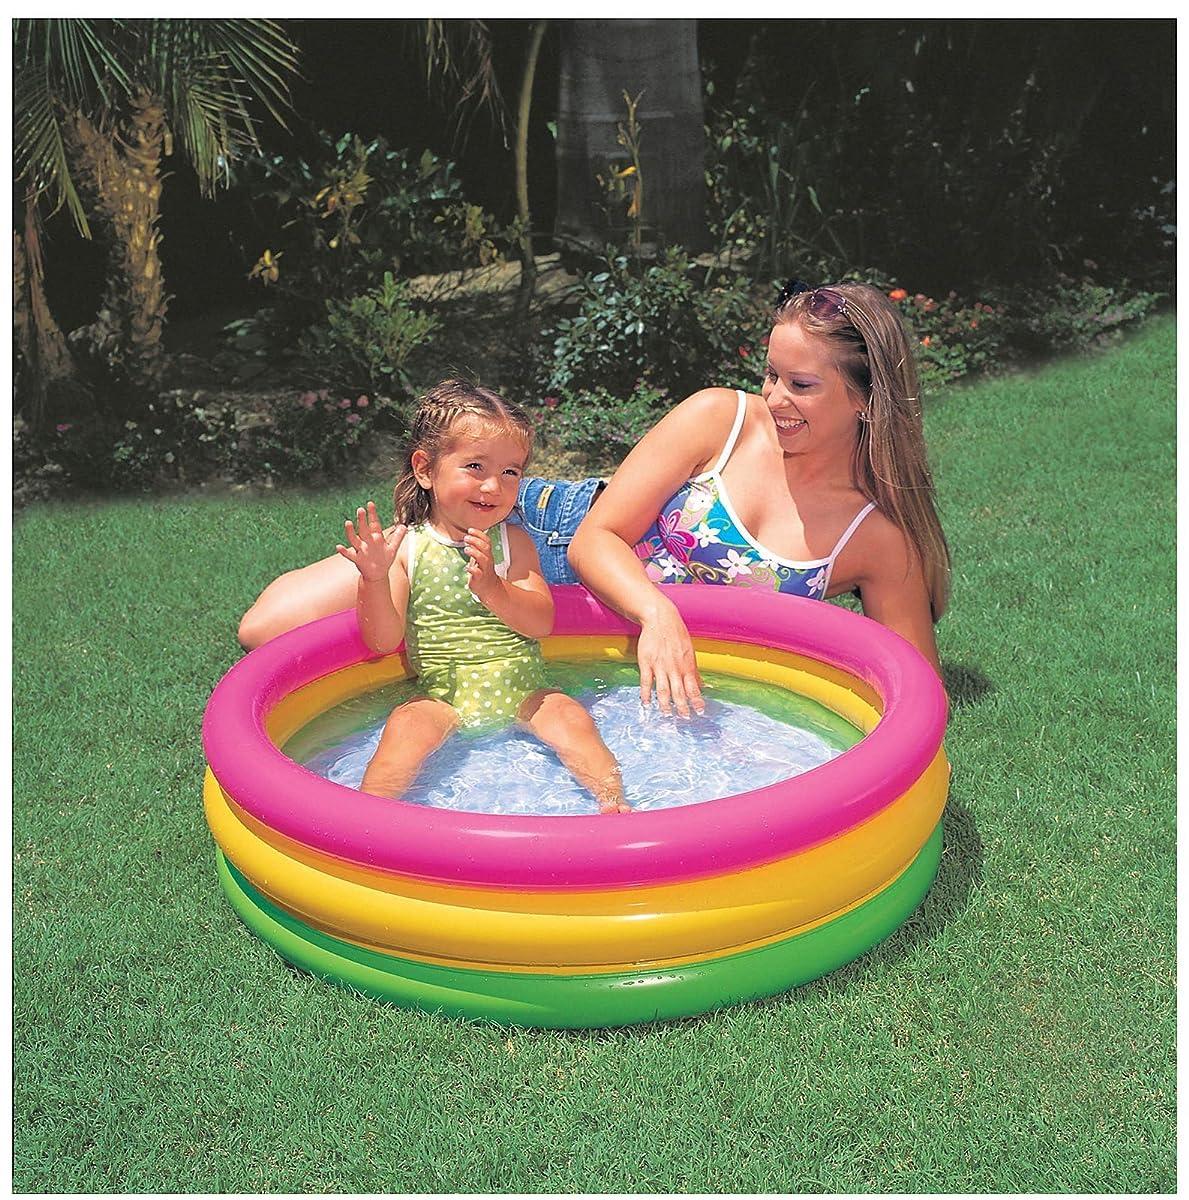 Intex Sunset Glow Baby Pool (34in x 10 in)